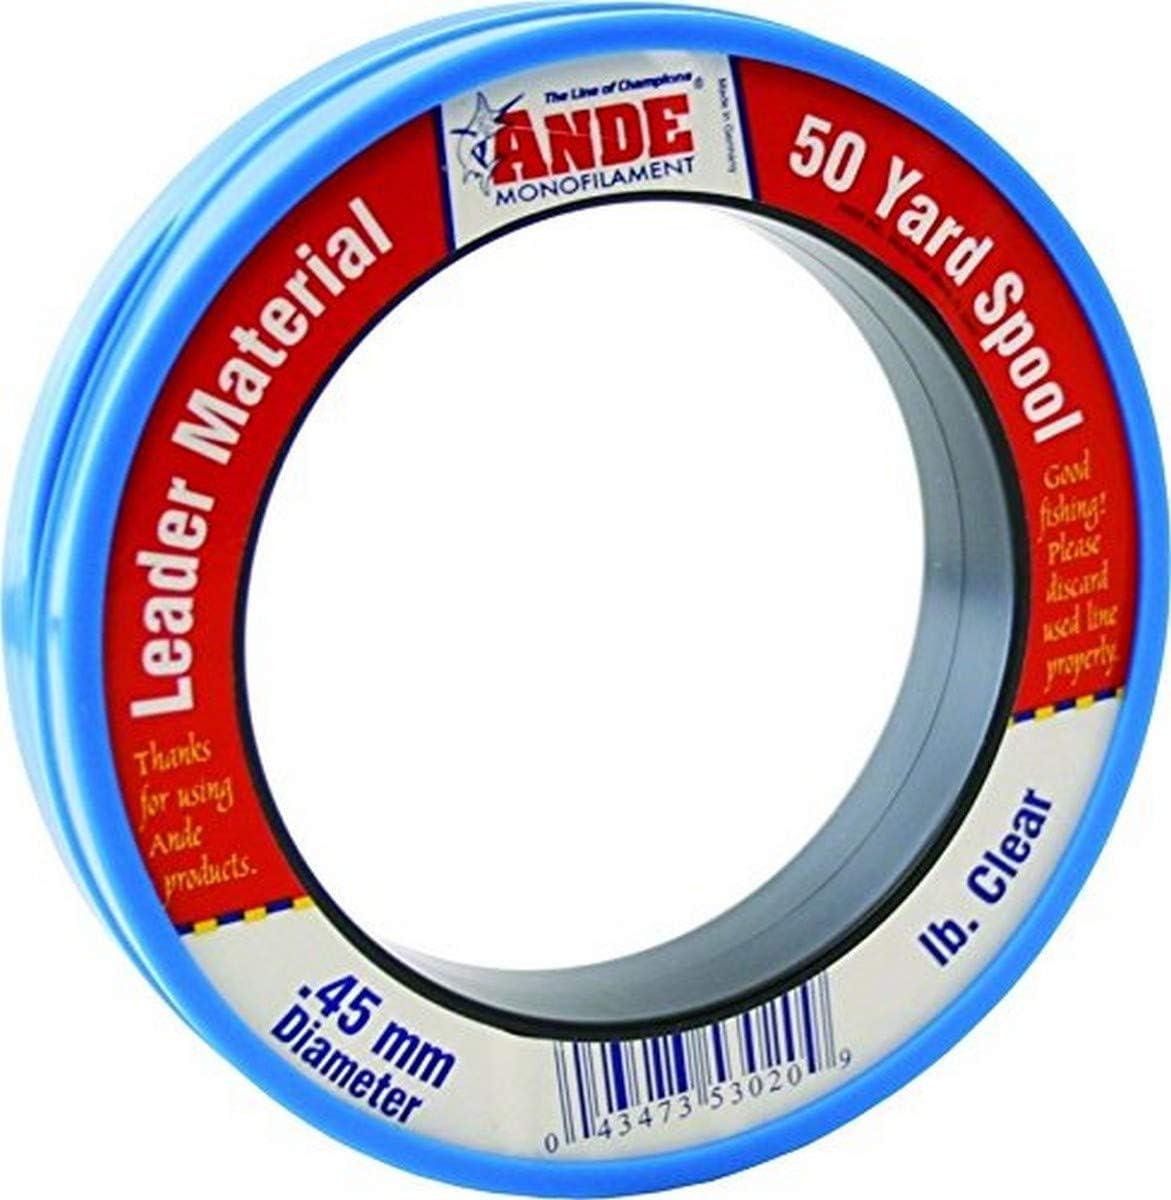 Ande 1 year warranty PCW Premium Fishing Rare Lines Clear 125 40 Yard lb